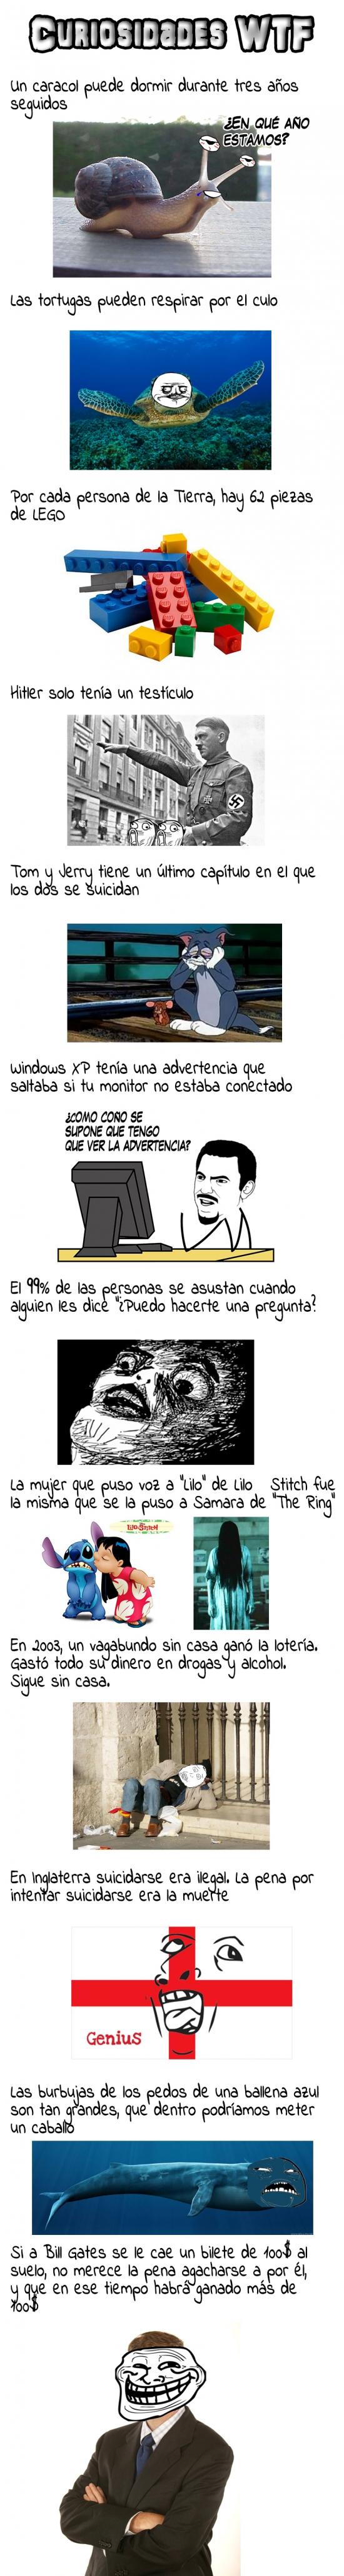 memes-curiosidades-wtf